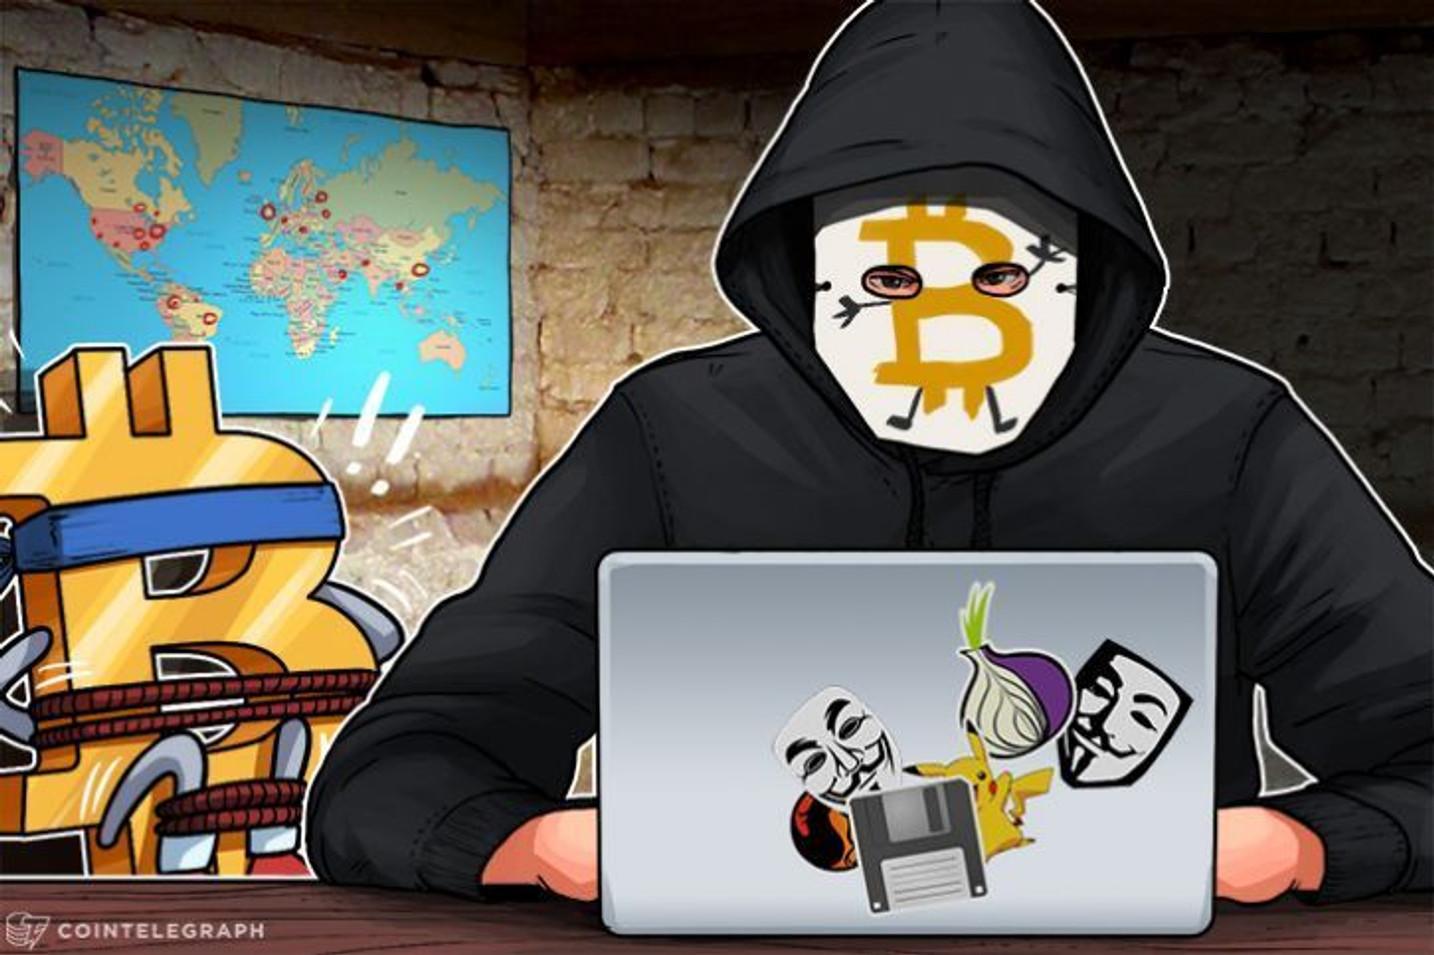 Europol: Zcash, Monero and Ethereum Follow Bitcoin in Cybercrime